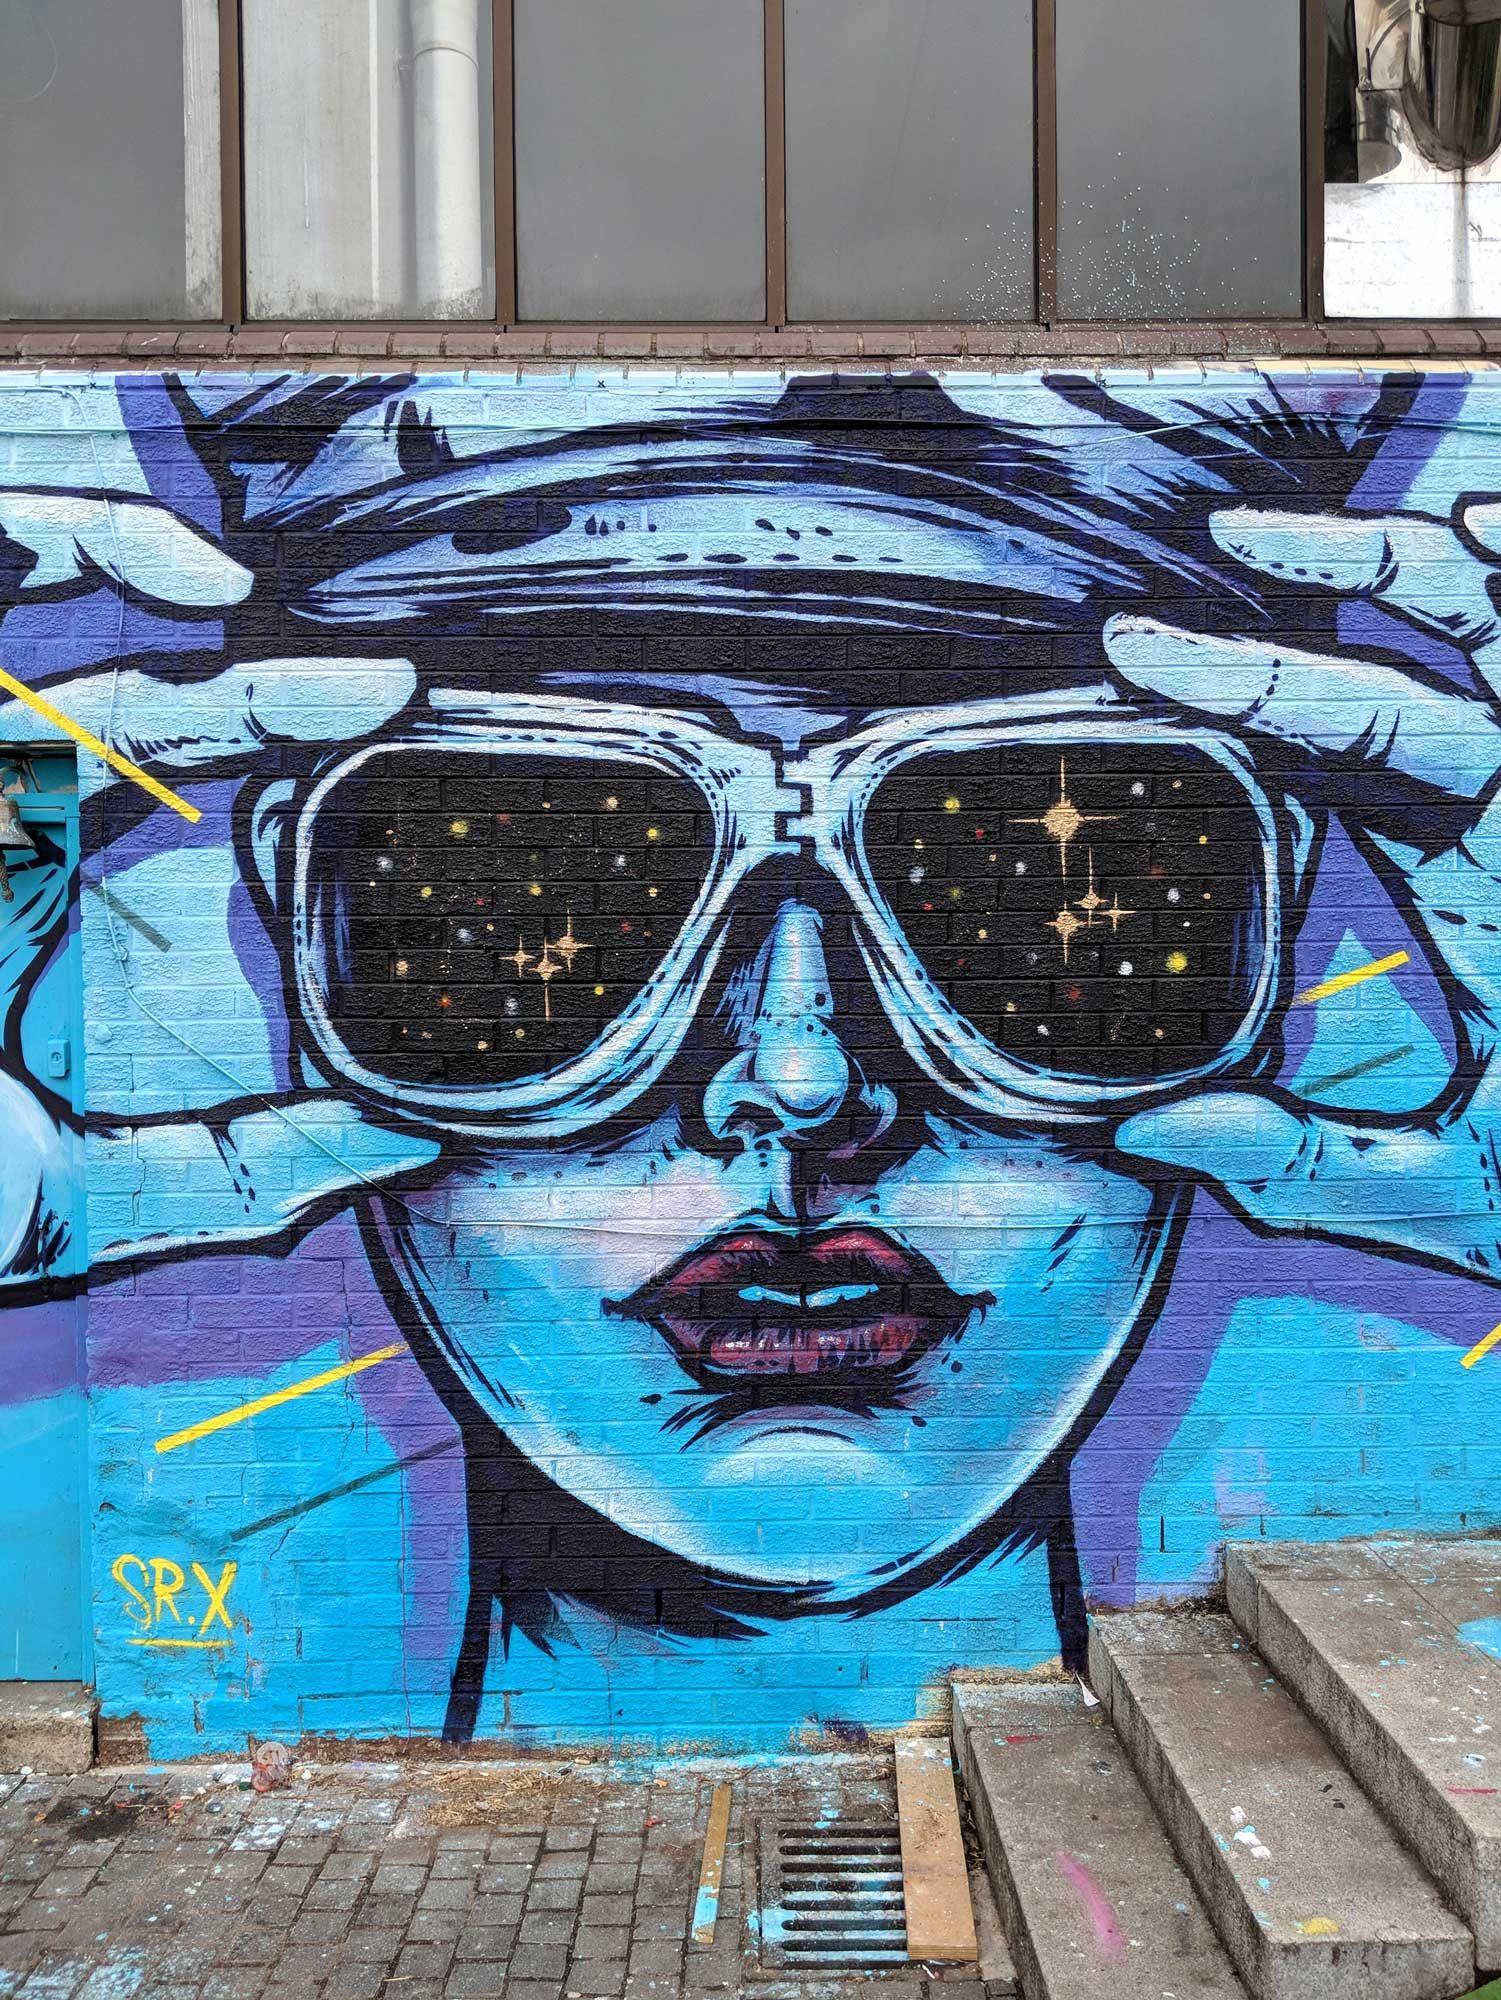 Enlightenment. By Sr. X. Street art mural painted in Manor House, London. . . . . . pop art, surrealism, illustration, grafitti, mural , stencil, paint, pintura, arte urbano, urban, ink, blue, fire, lighter, retro, vintage, ad, advert, americana, 50s, 60s, woman, space, stars, vision, glasses #graffitiart